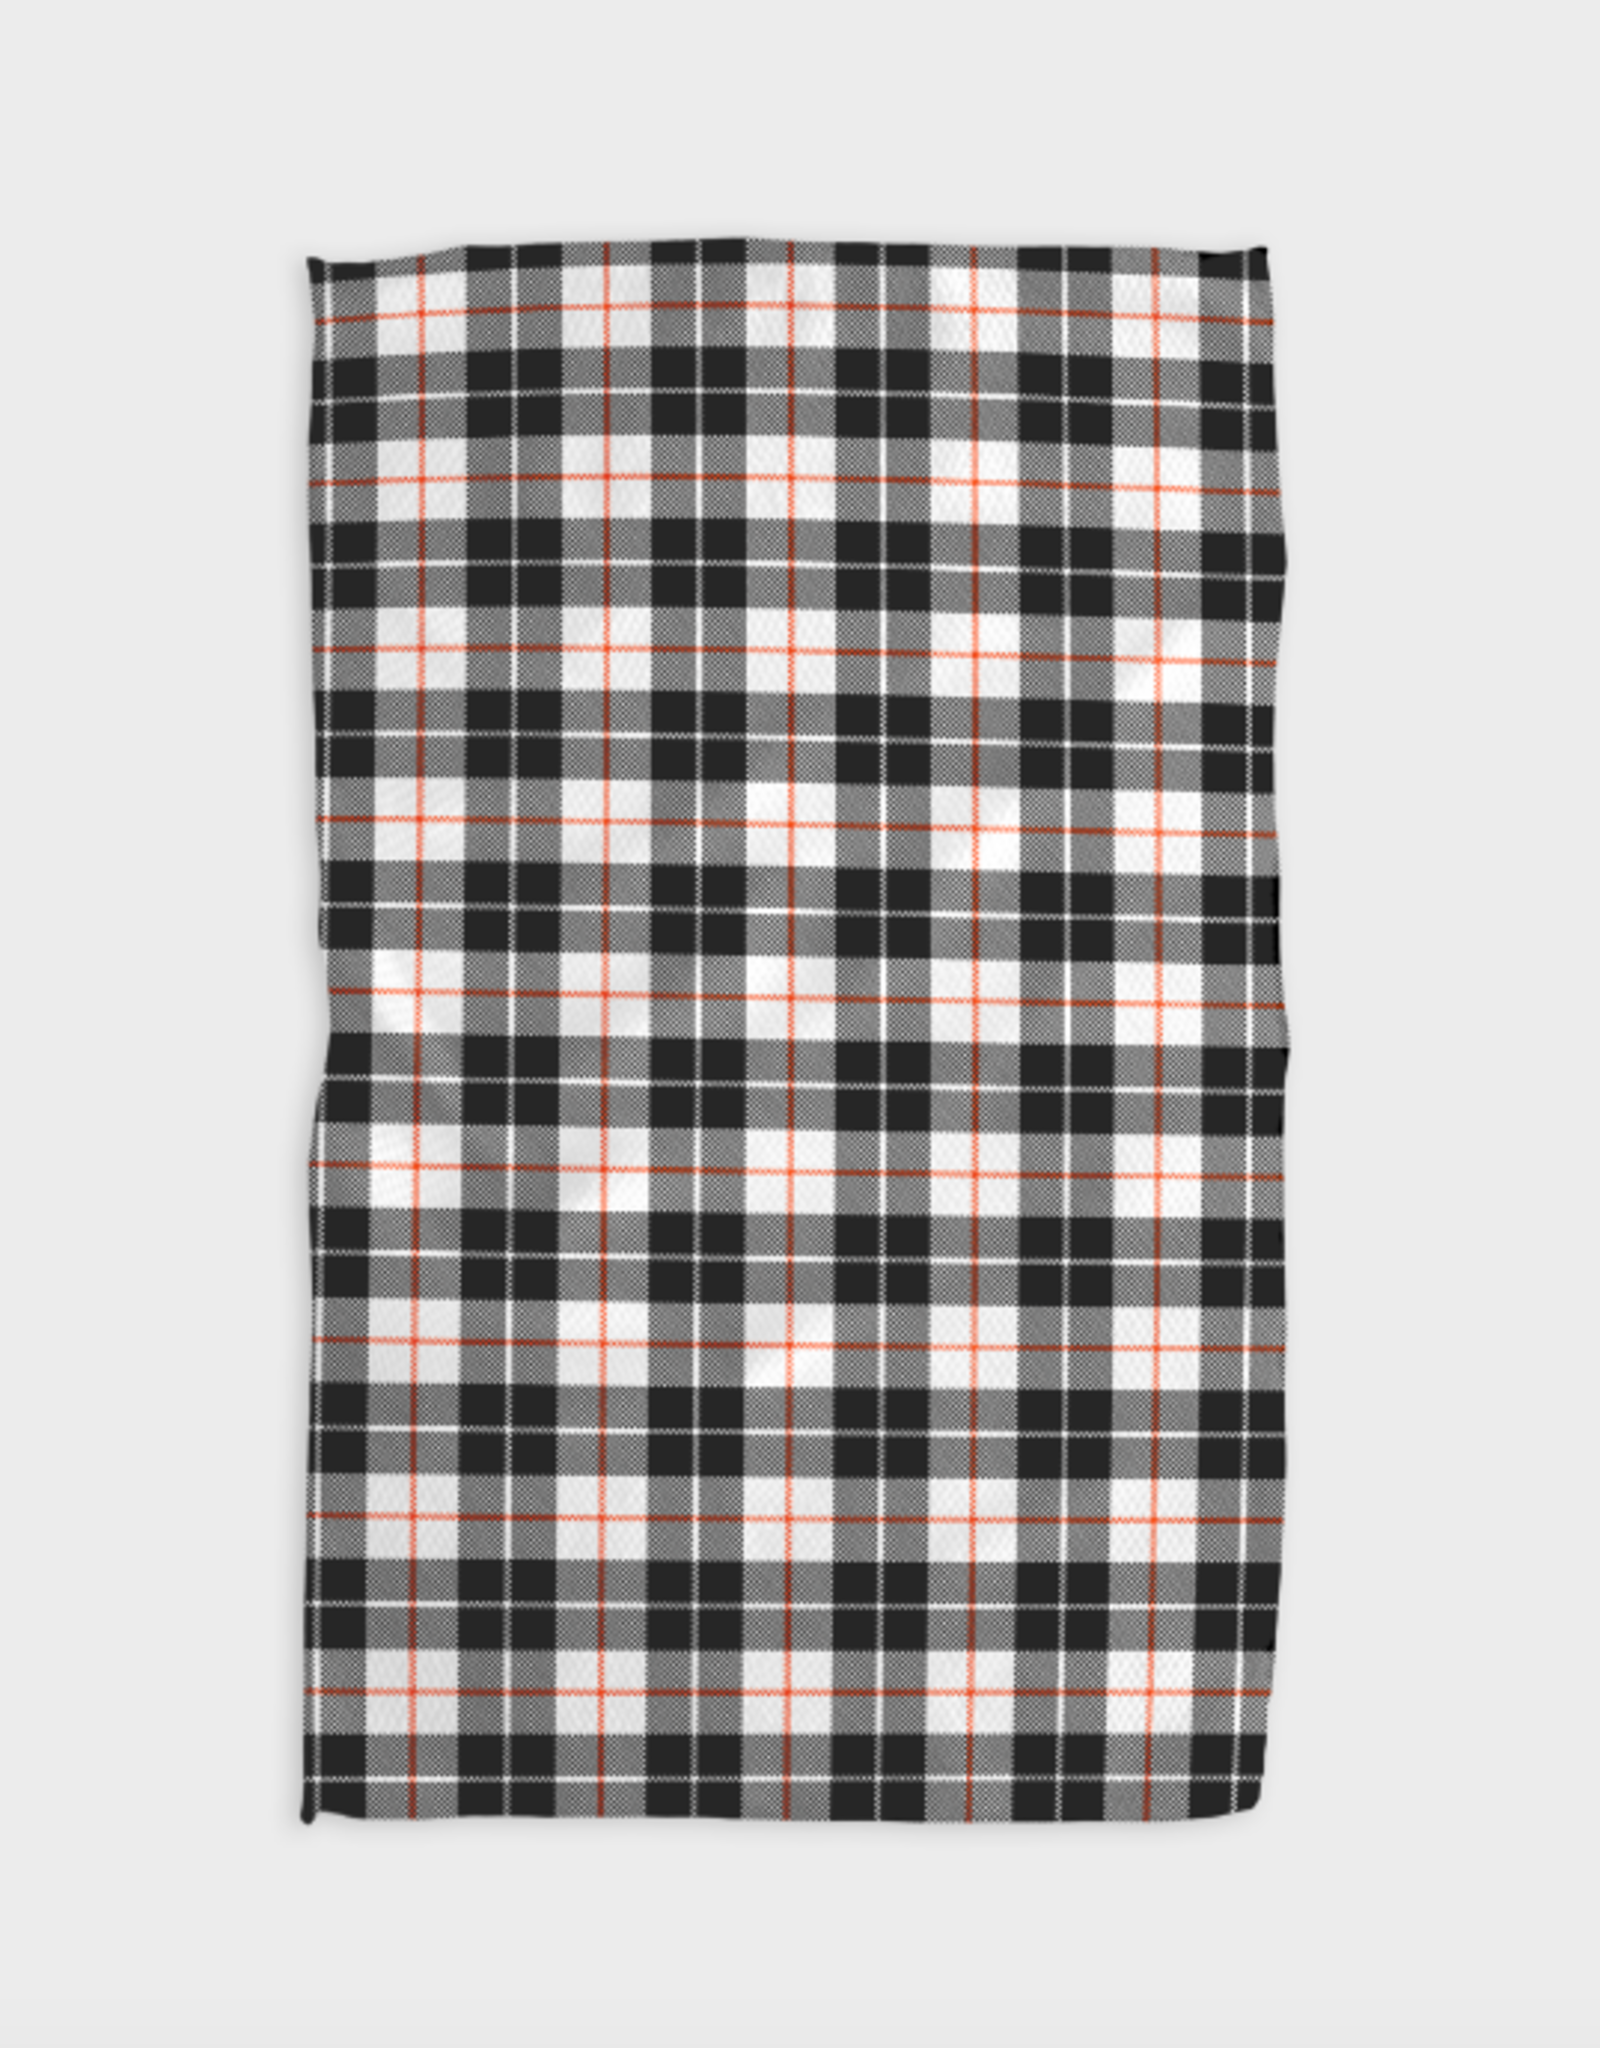 Ging Bucky Kitchen Tea Towel